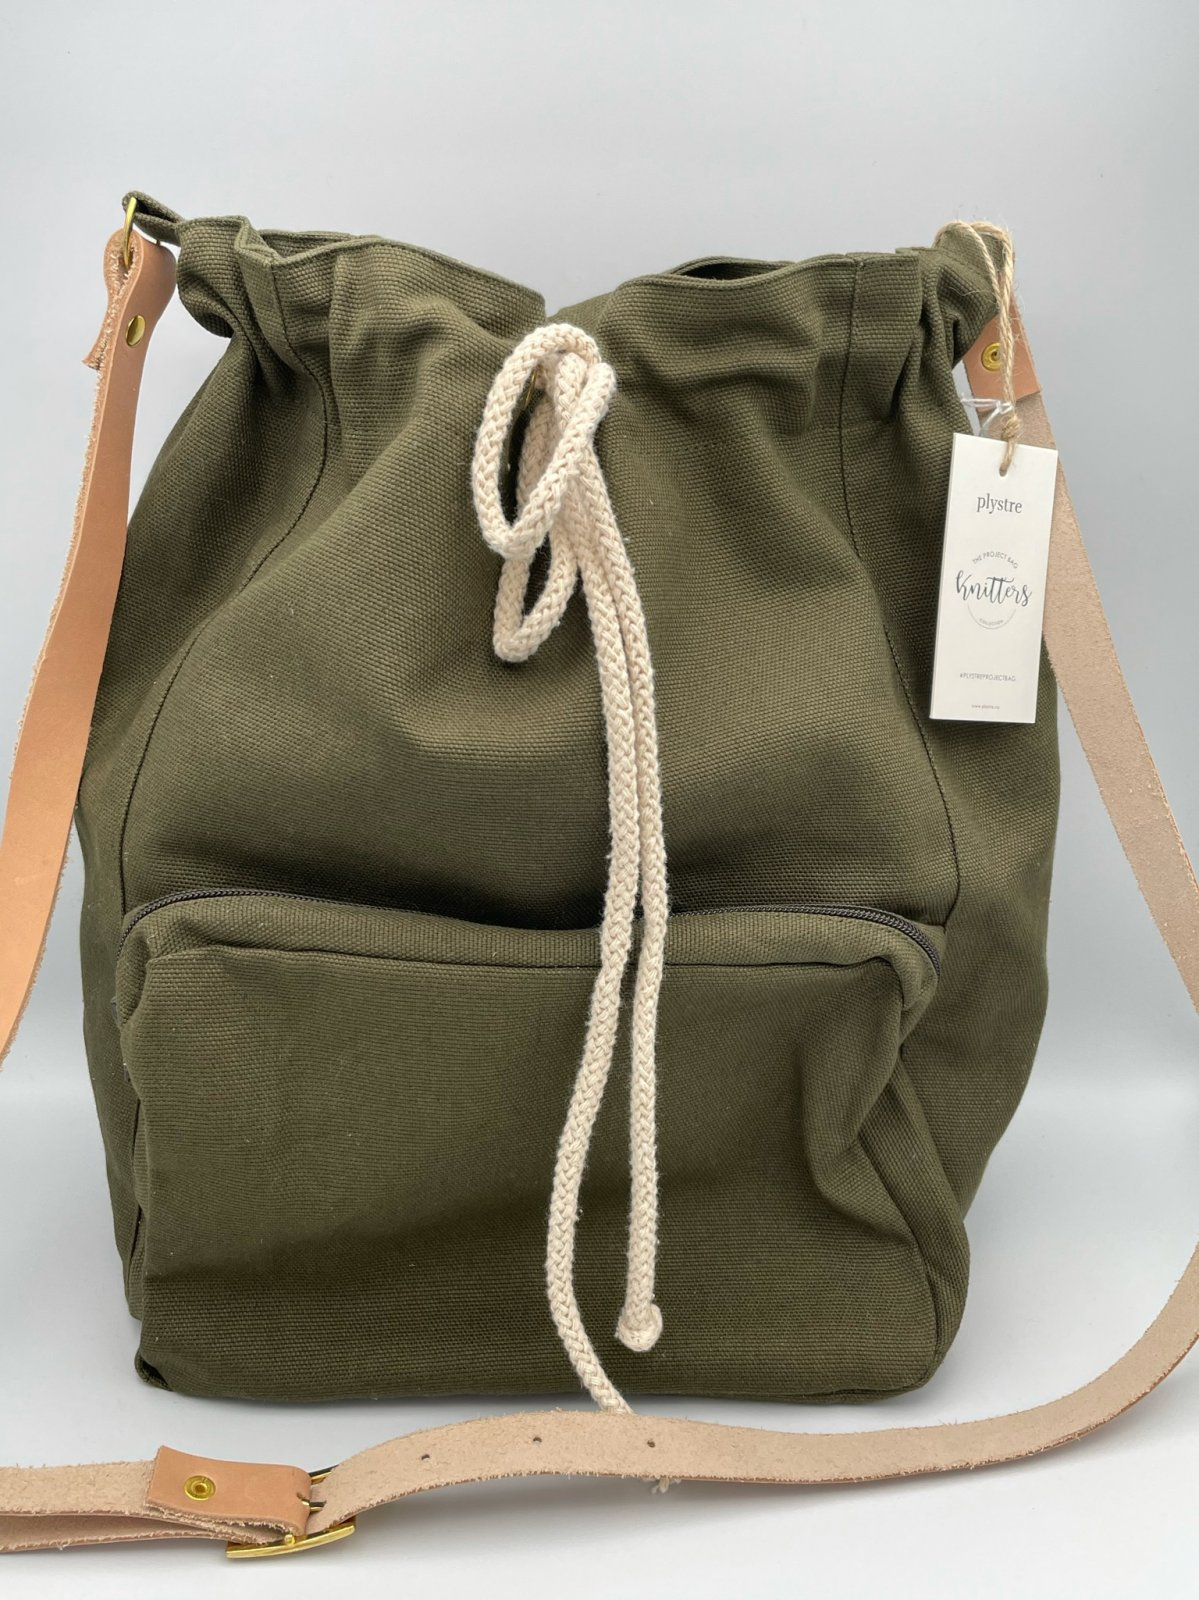 Plystre - Cross Body Bag